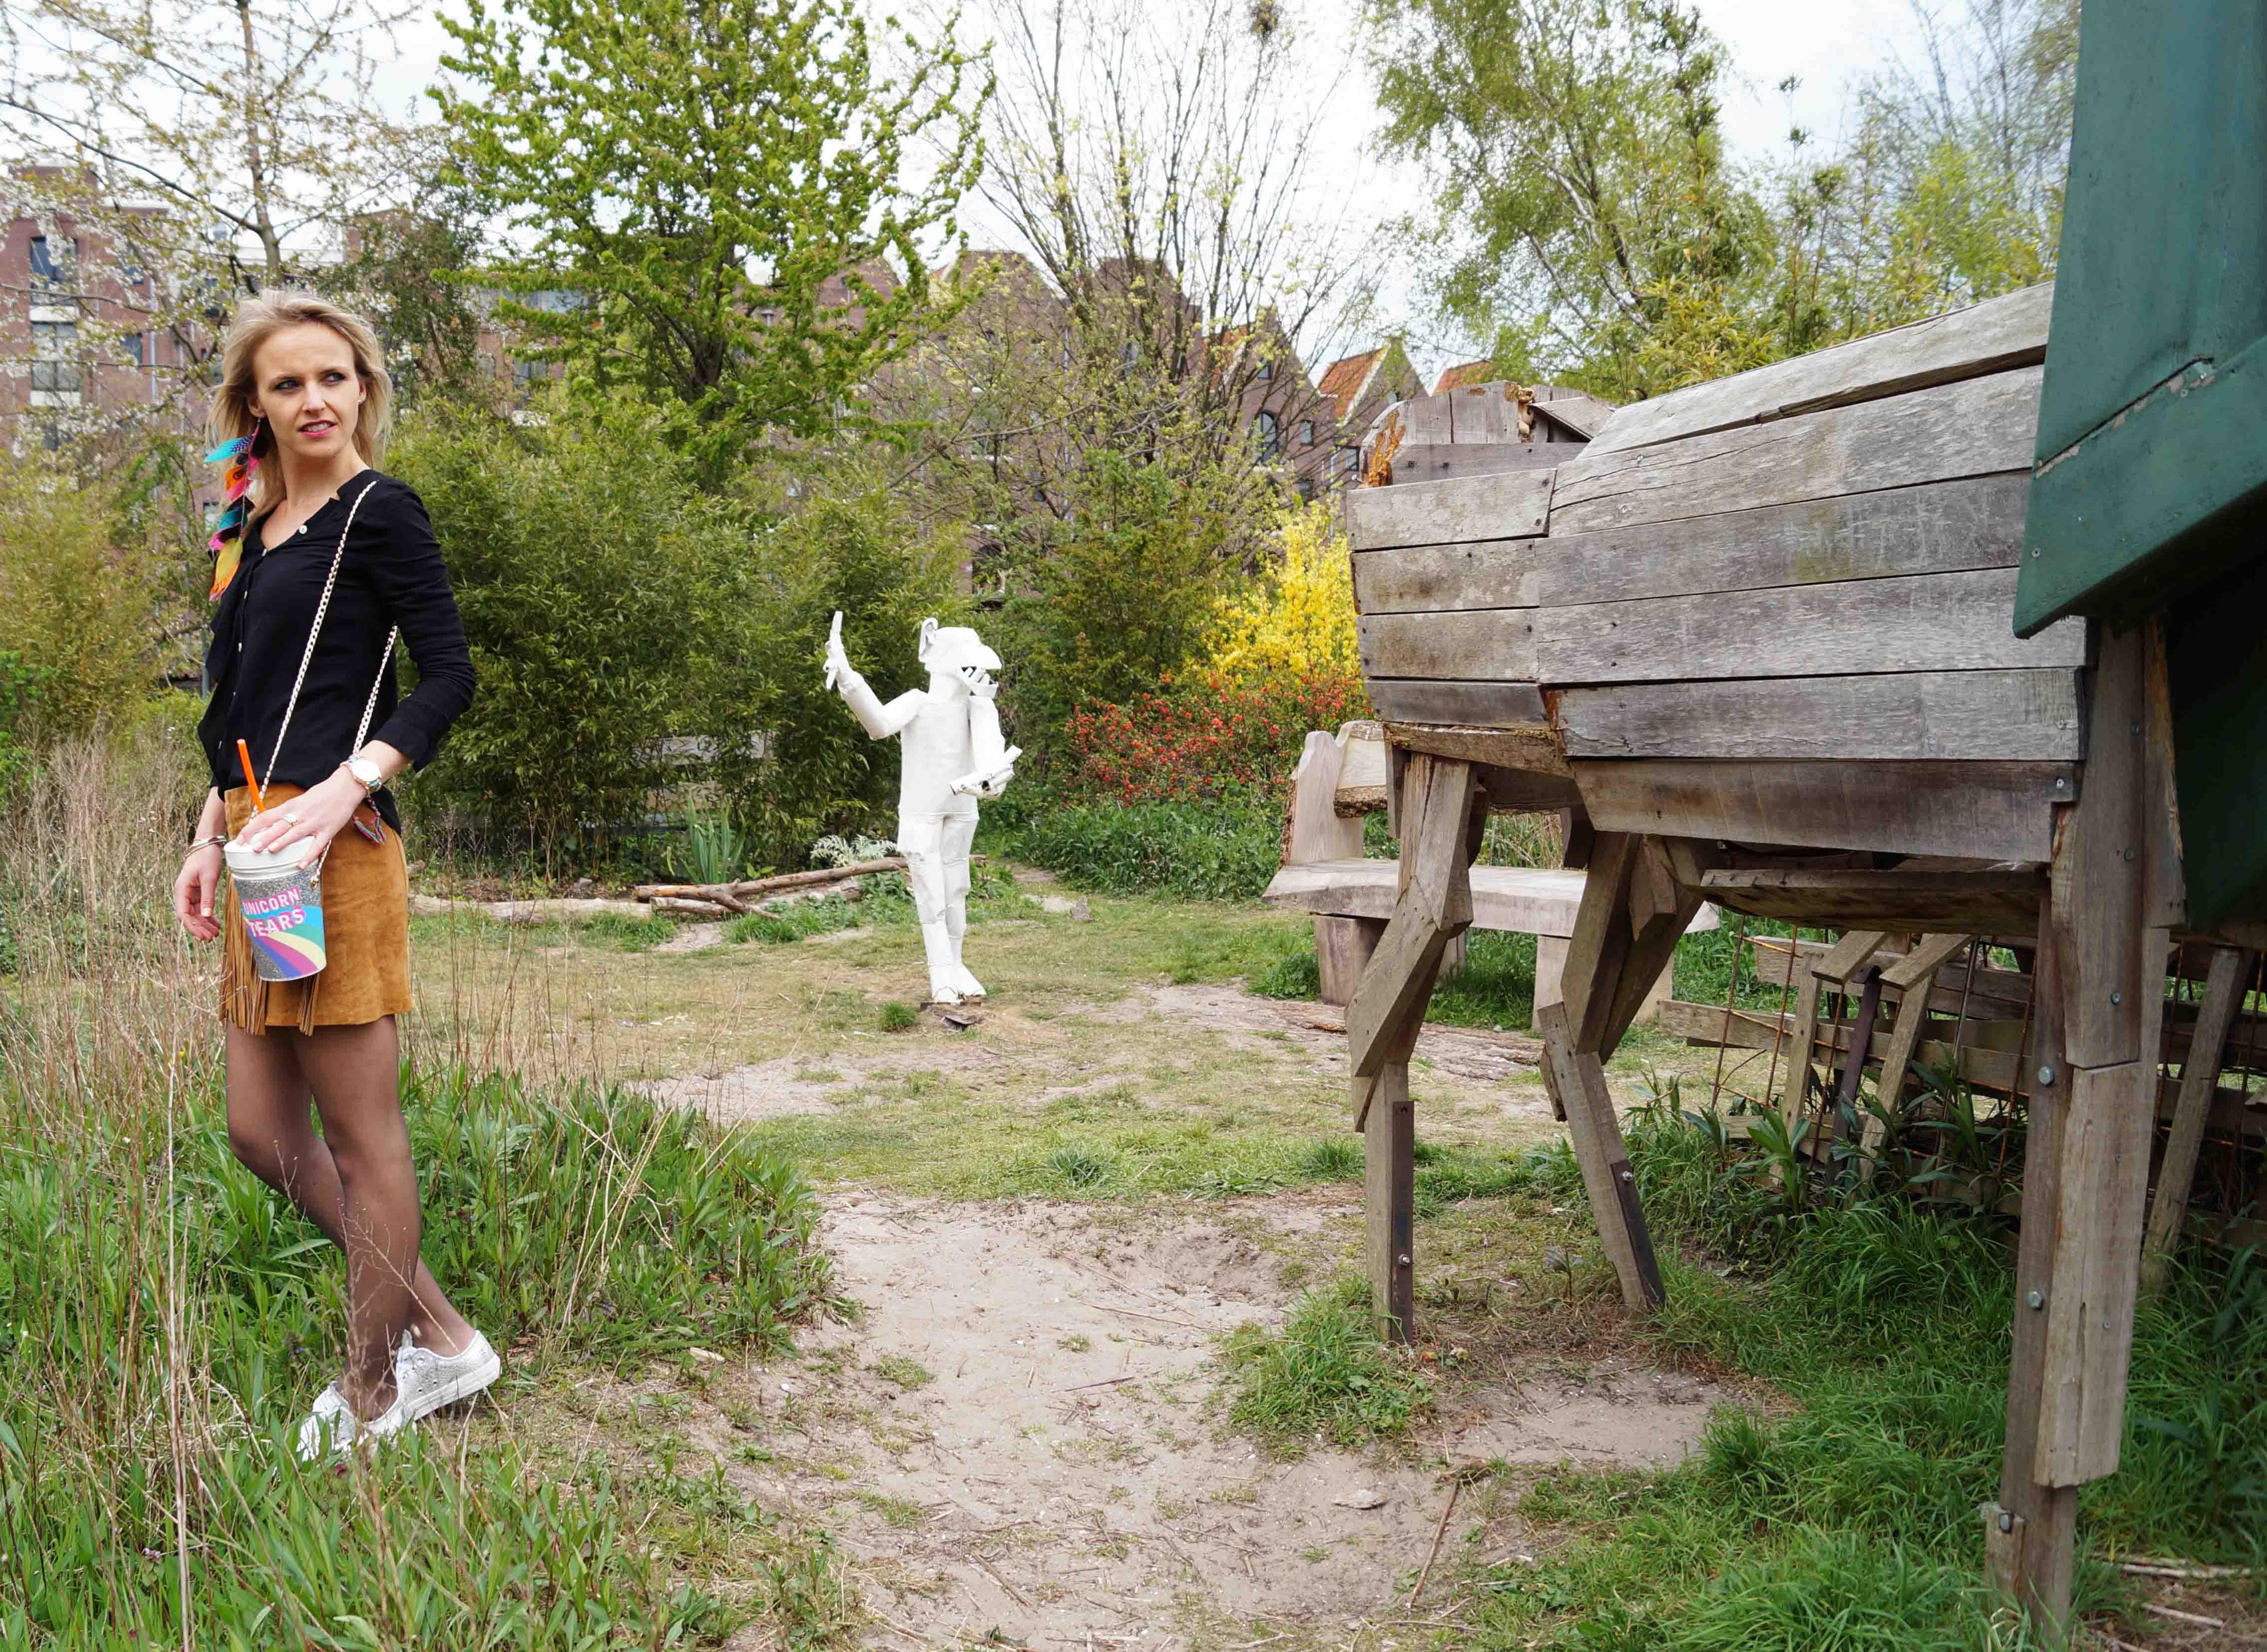 Bag at You - Fashion Blog - Festival outfit - ootd - Franje rok - feathers - Party Bag - Milkshake tas - Unicorn schoudertas